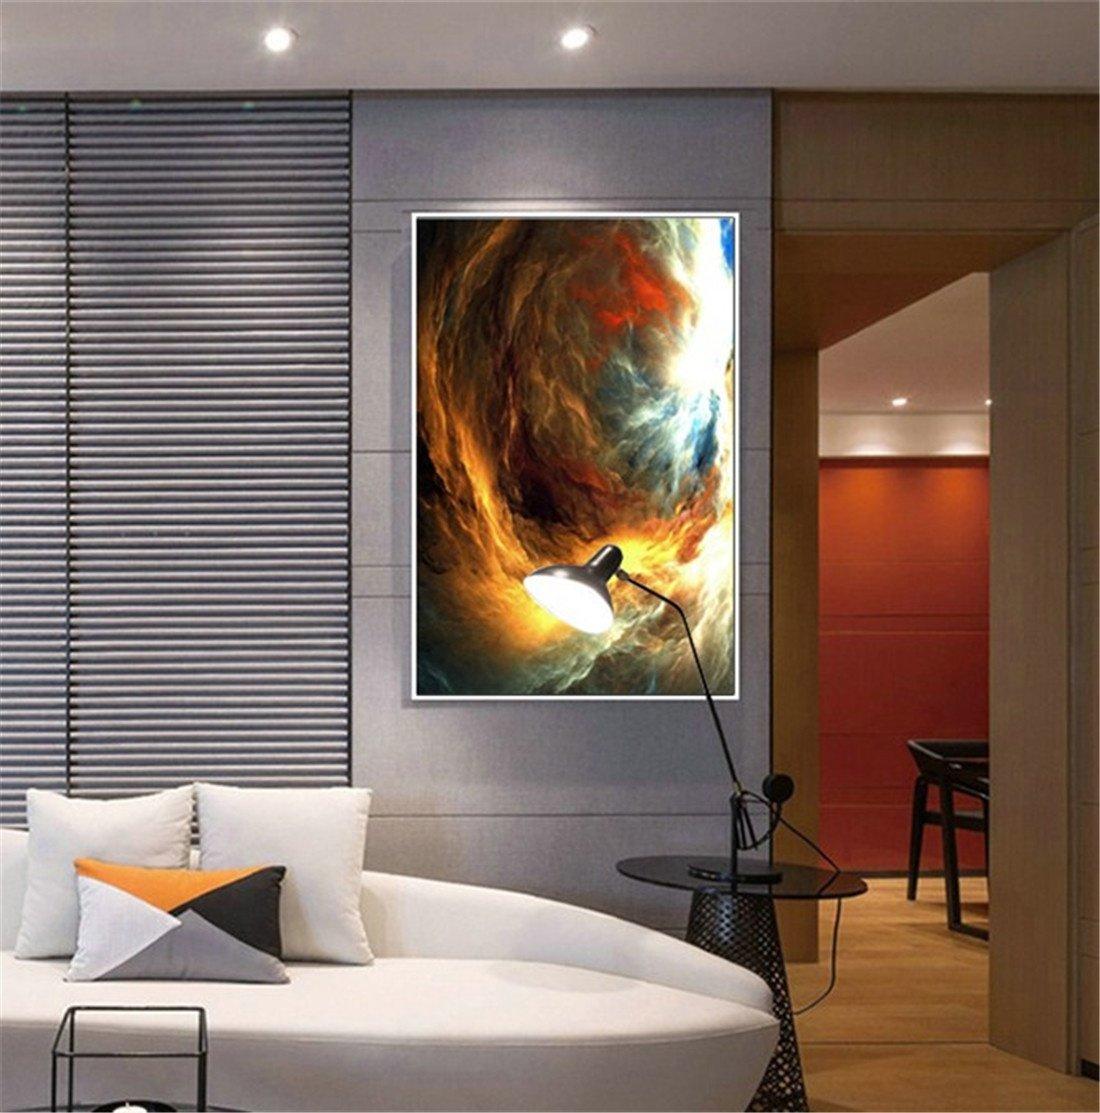 Barato Bing BINGConcha Nebulosa Moderna Corredor Vertical Pintura Abstracta Dormitorio Restaurante Pintura Mural Sala de Estar Pintura Decorativa Pintura Decorativa (75  50cm)